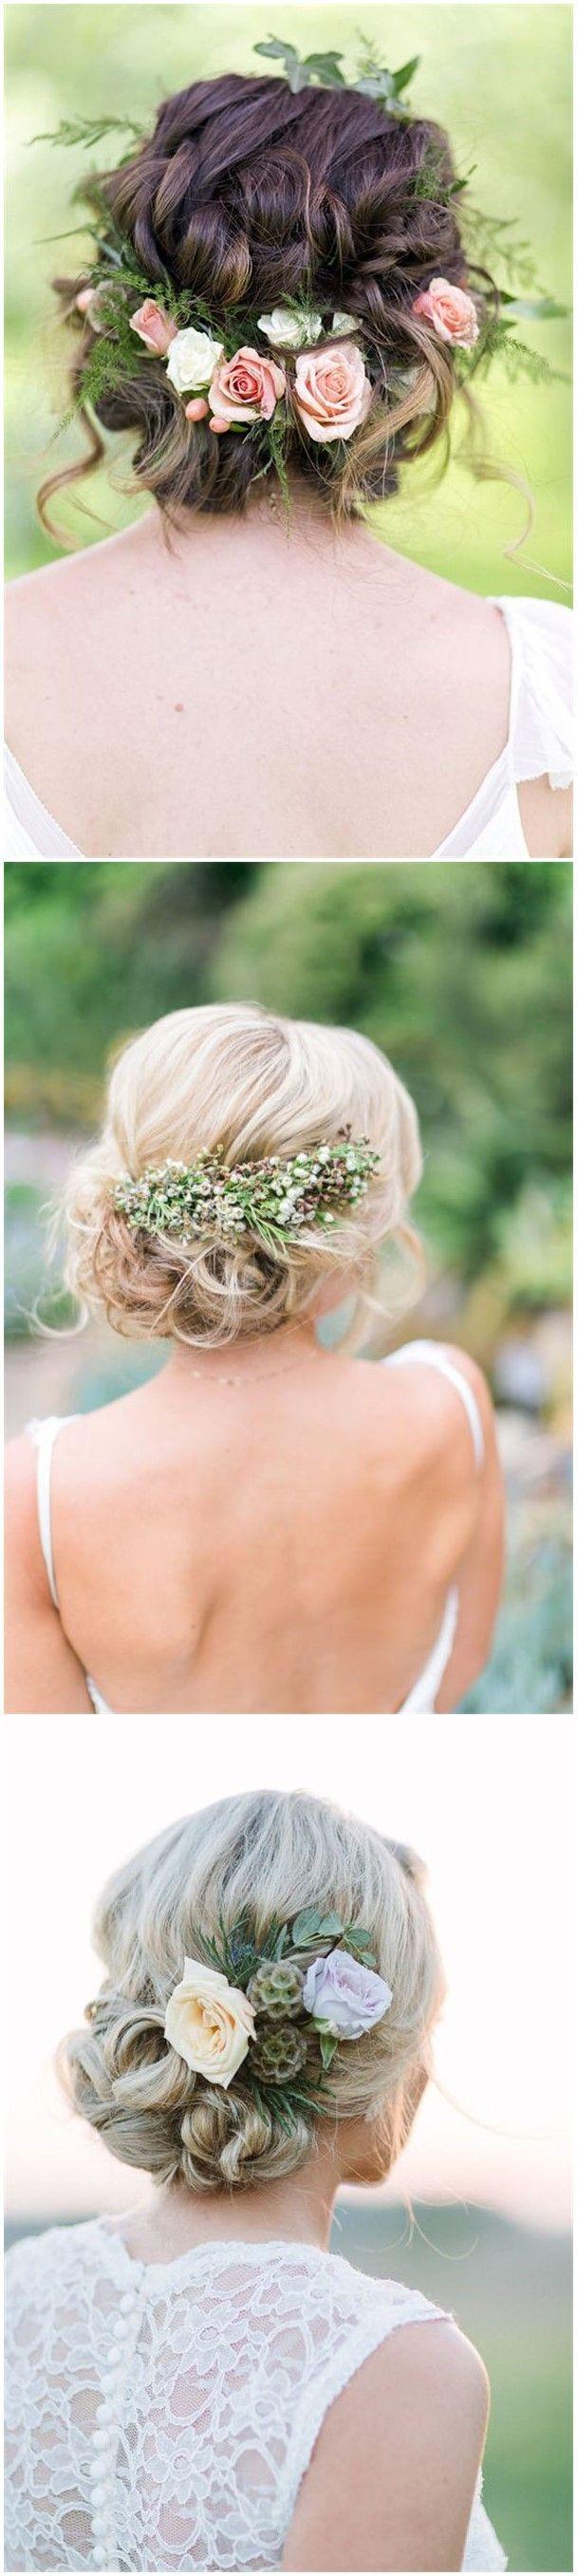 Wedding Hairstyles»18 Wedding Updo Hairstyles…